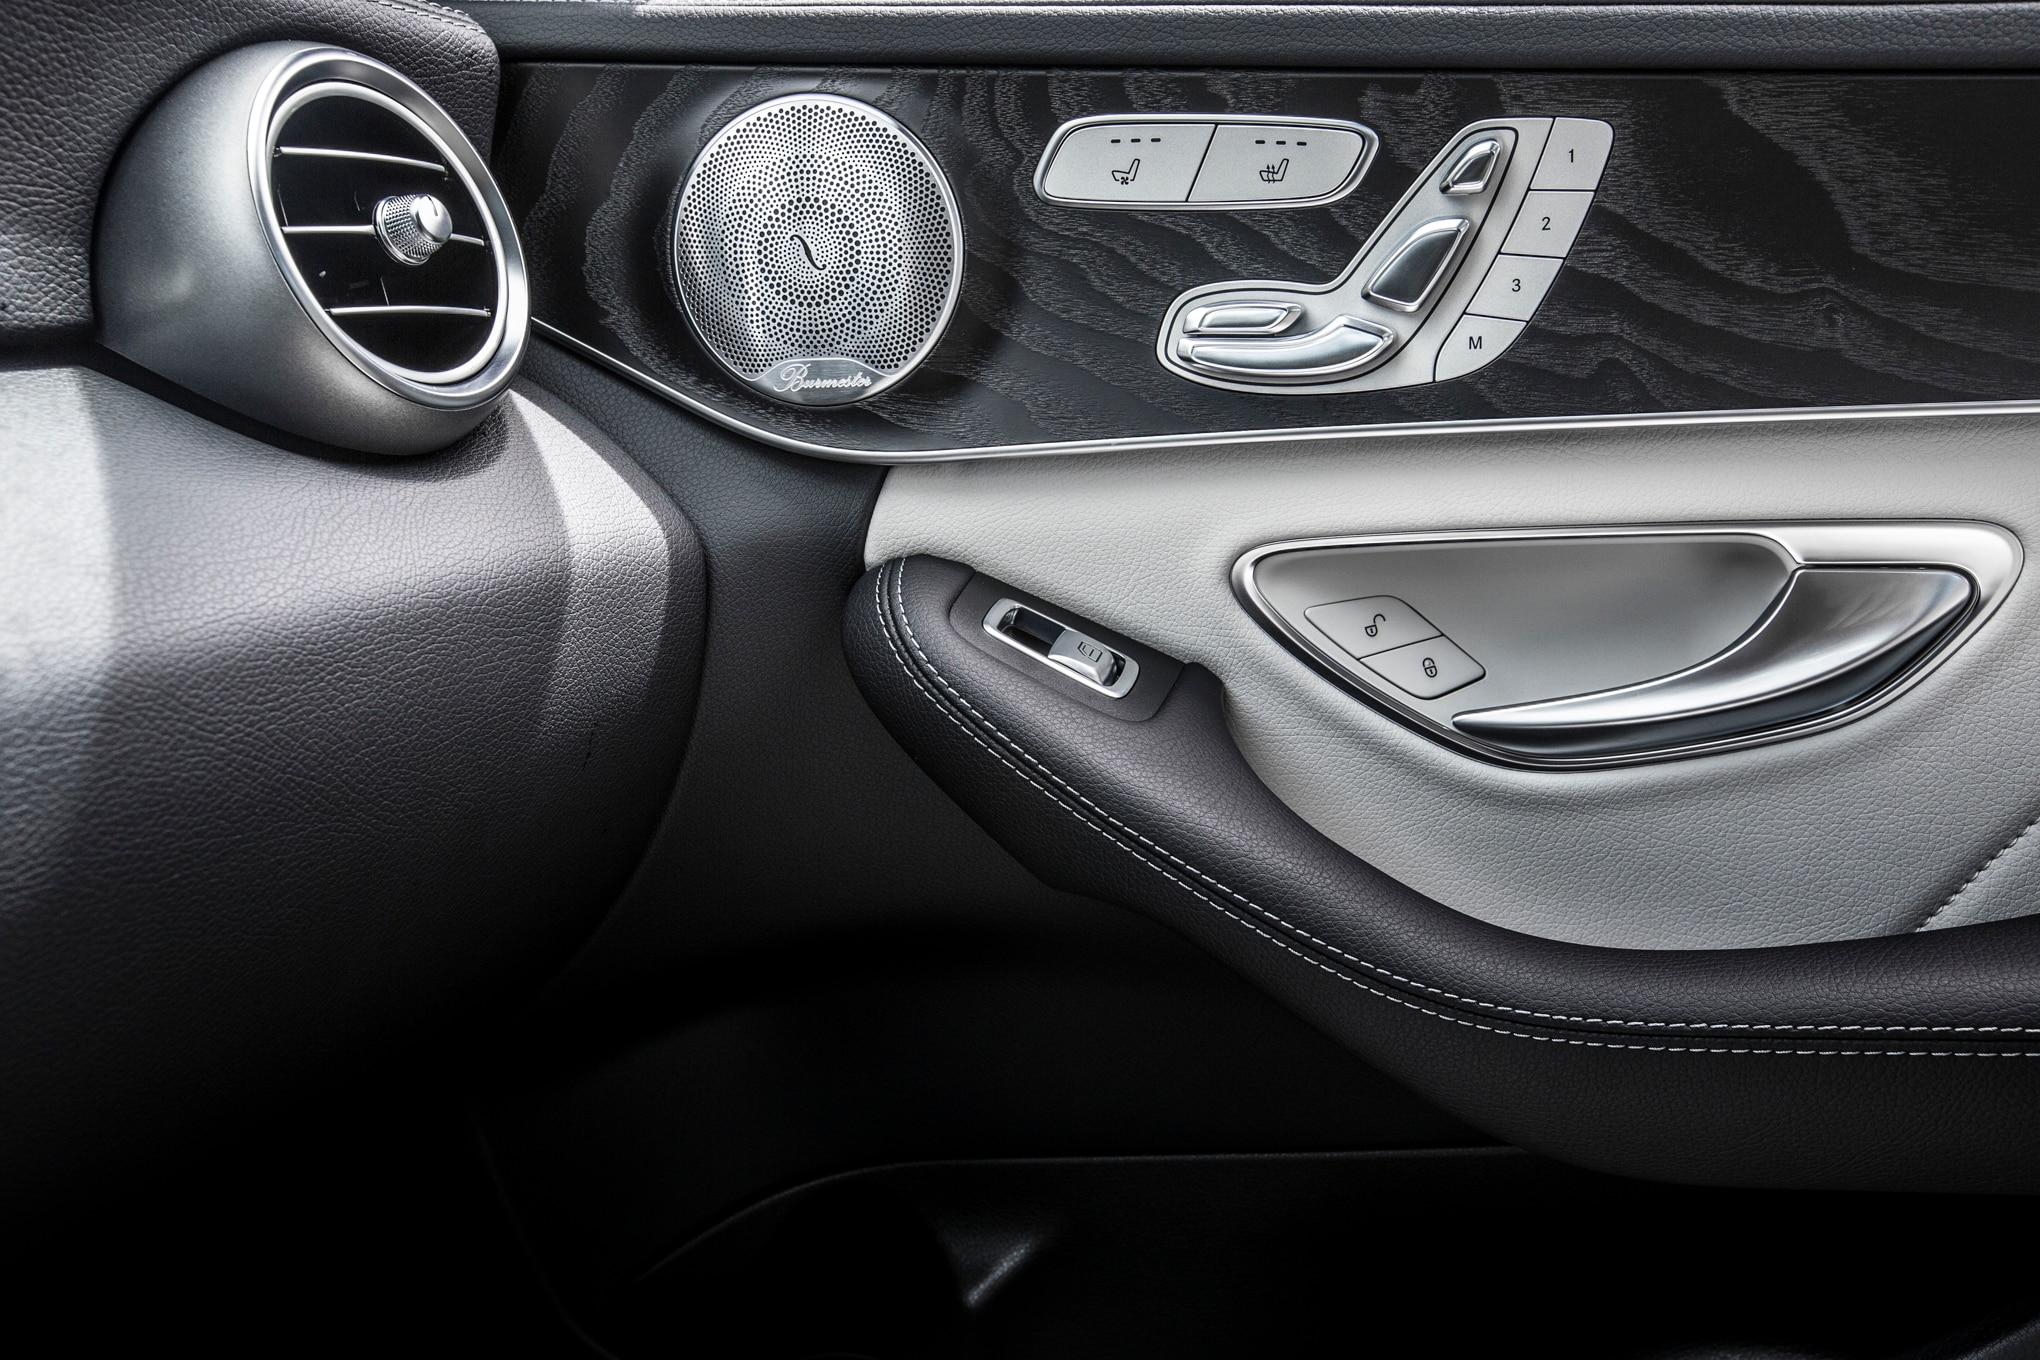 2015 mercedes benz c class review for Mercedes benz c class 2015 interior